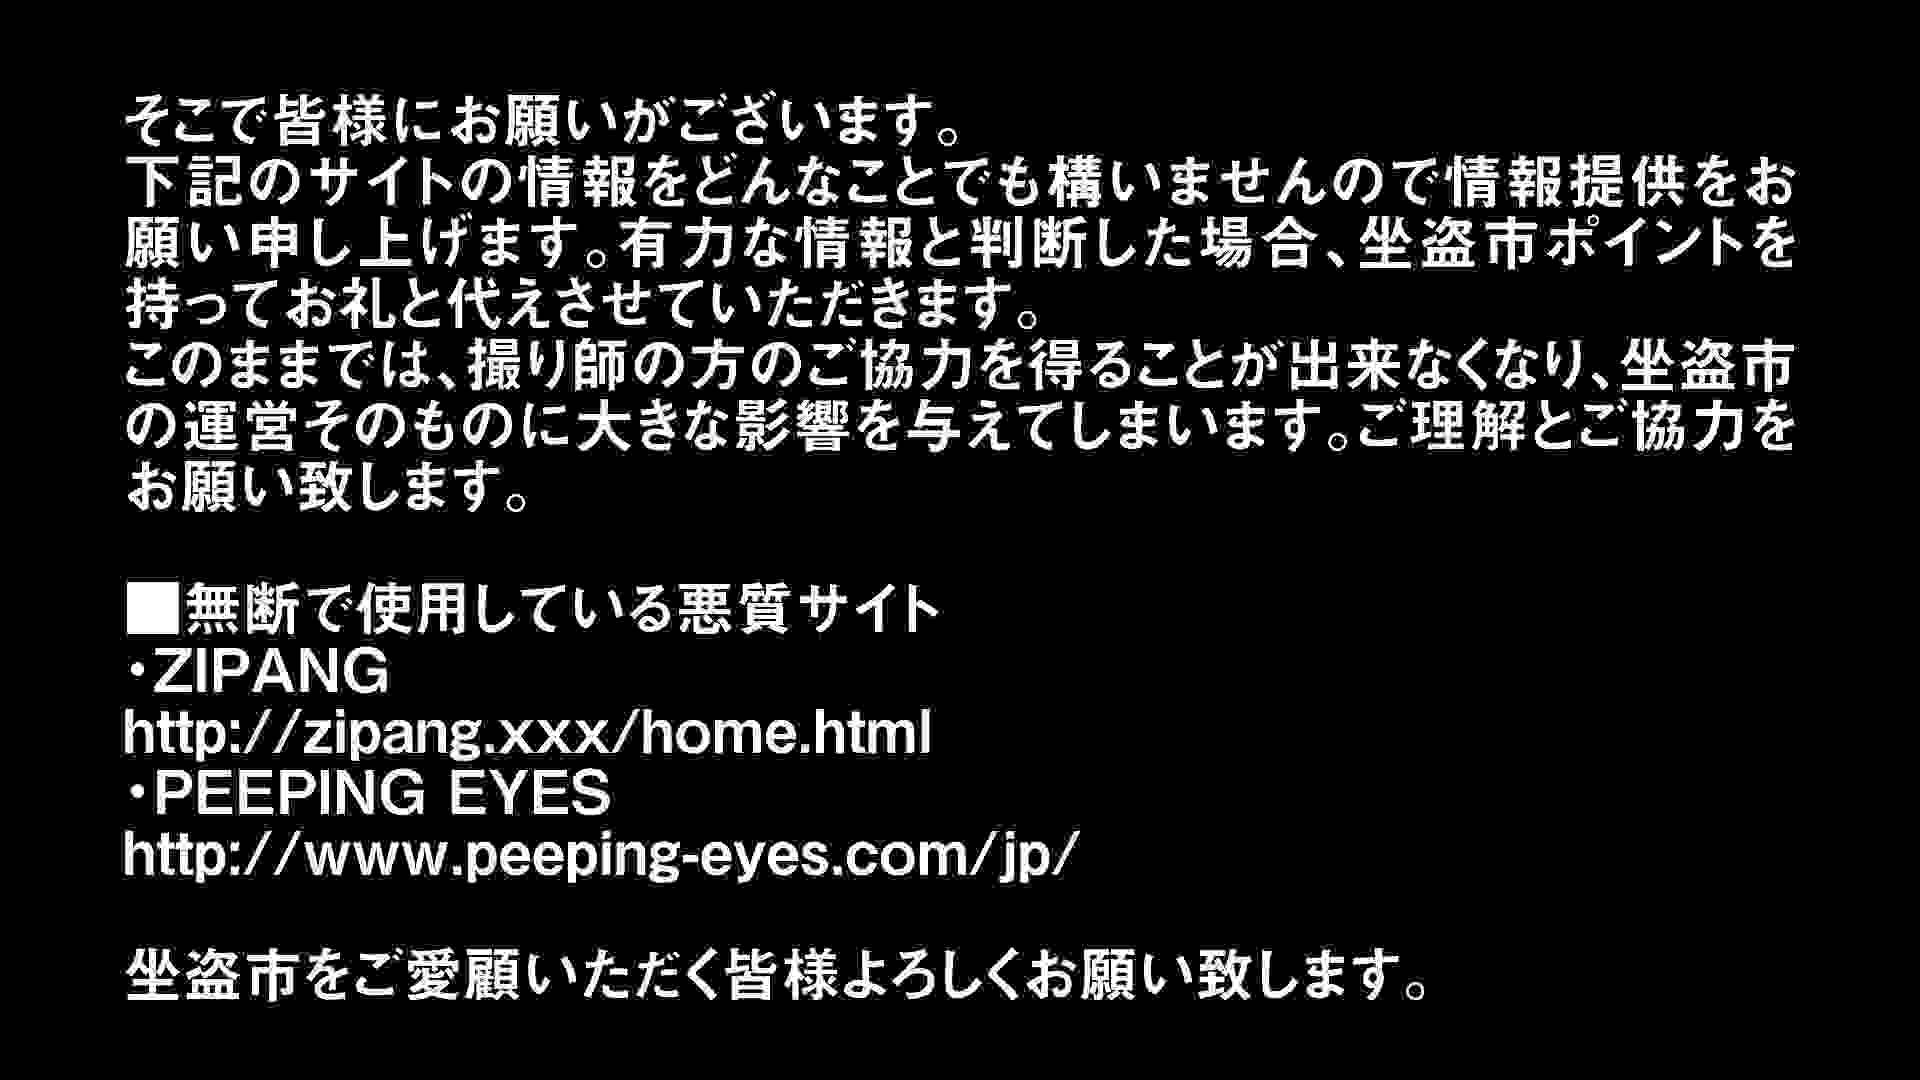 Aquaな露天風呂Vol.297 女体盗撮   OL女体  91連発 37